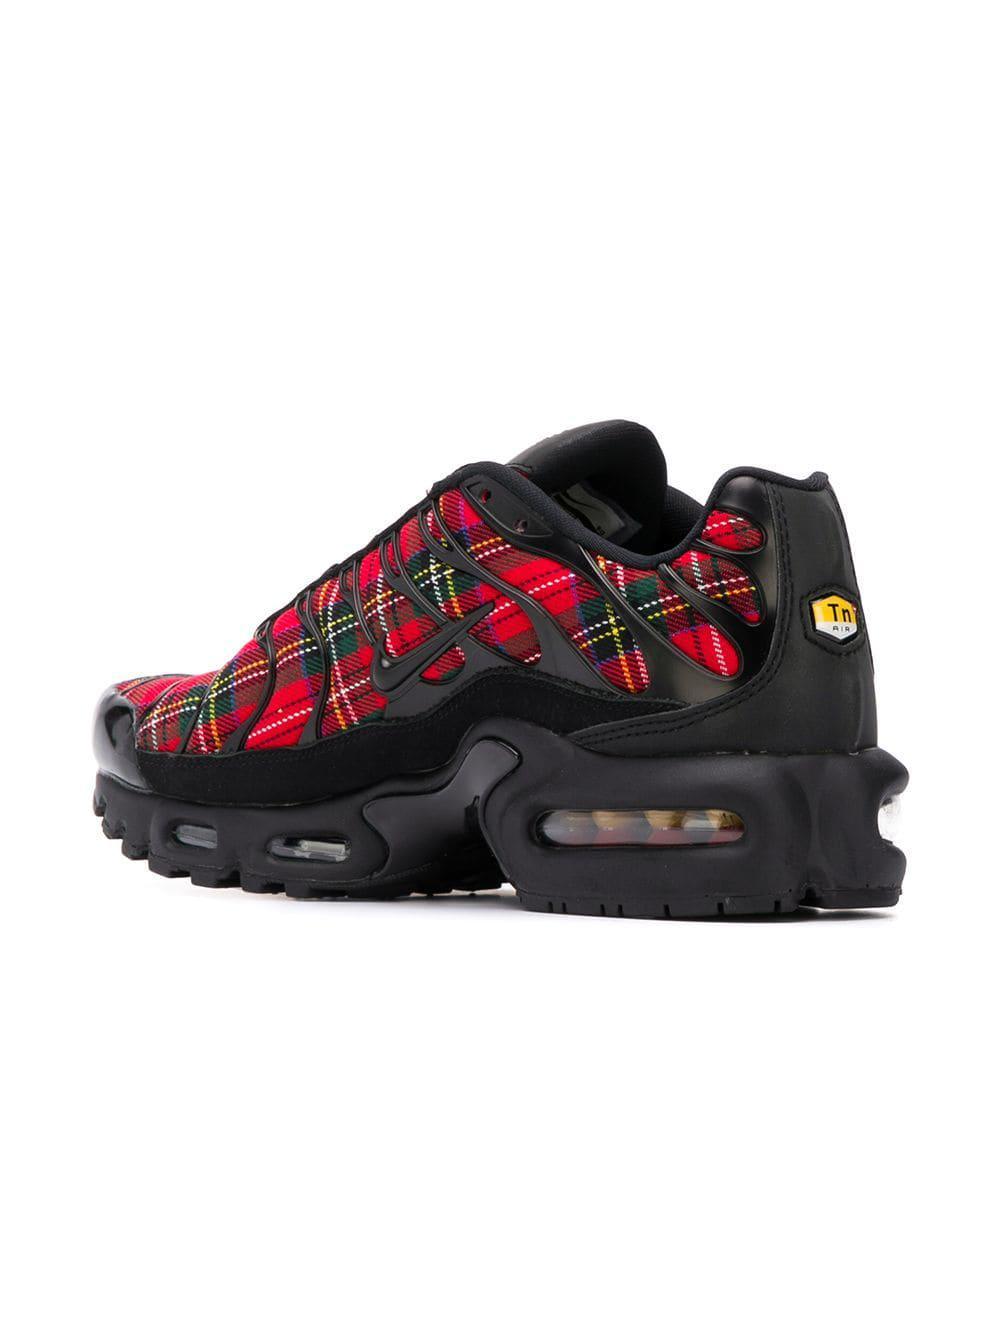 0f926d143e Nike Air Max Plus Tartan Sneakers in Red - Lyst